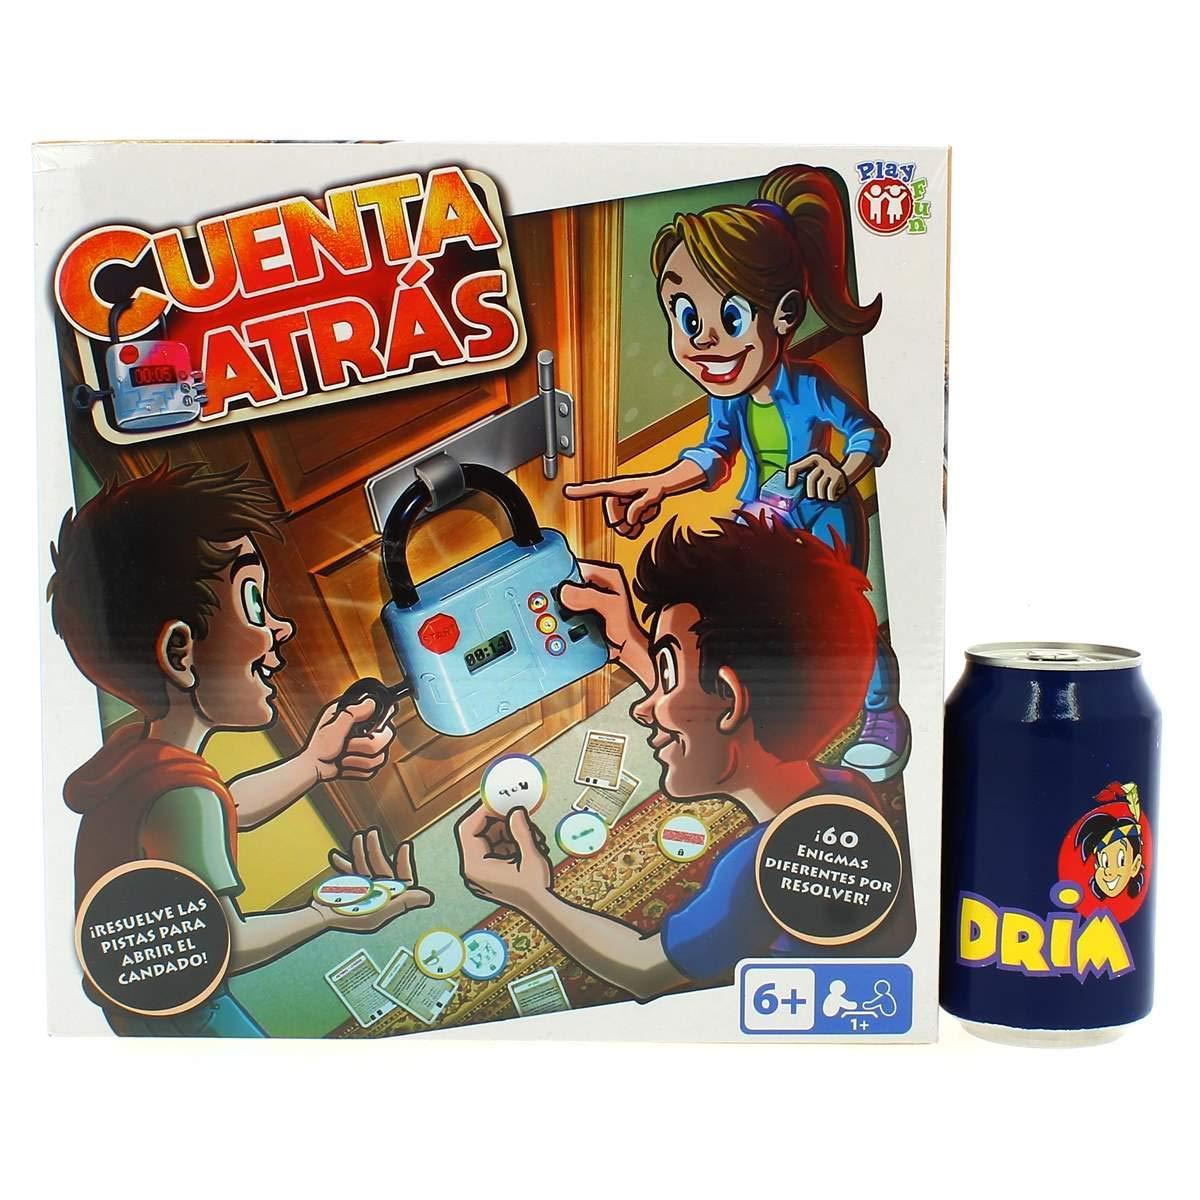 IMC Toys- Cuenta Atrà S, (IMC T OYS 98459)